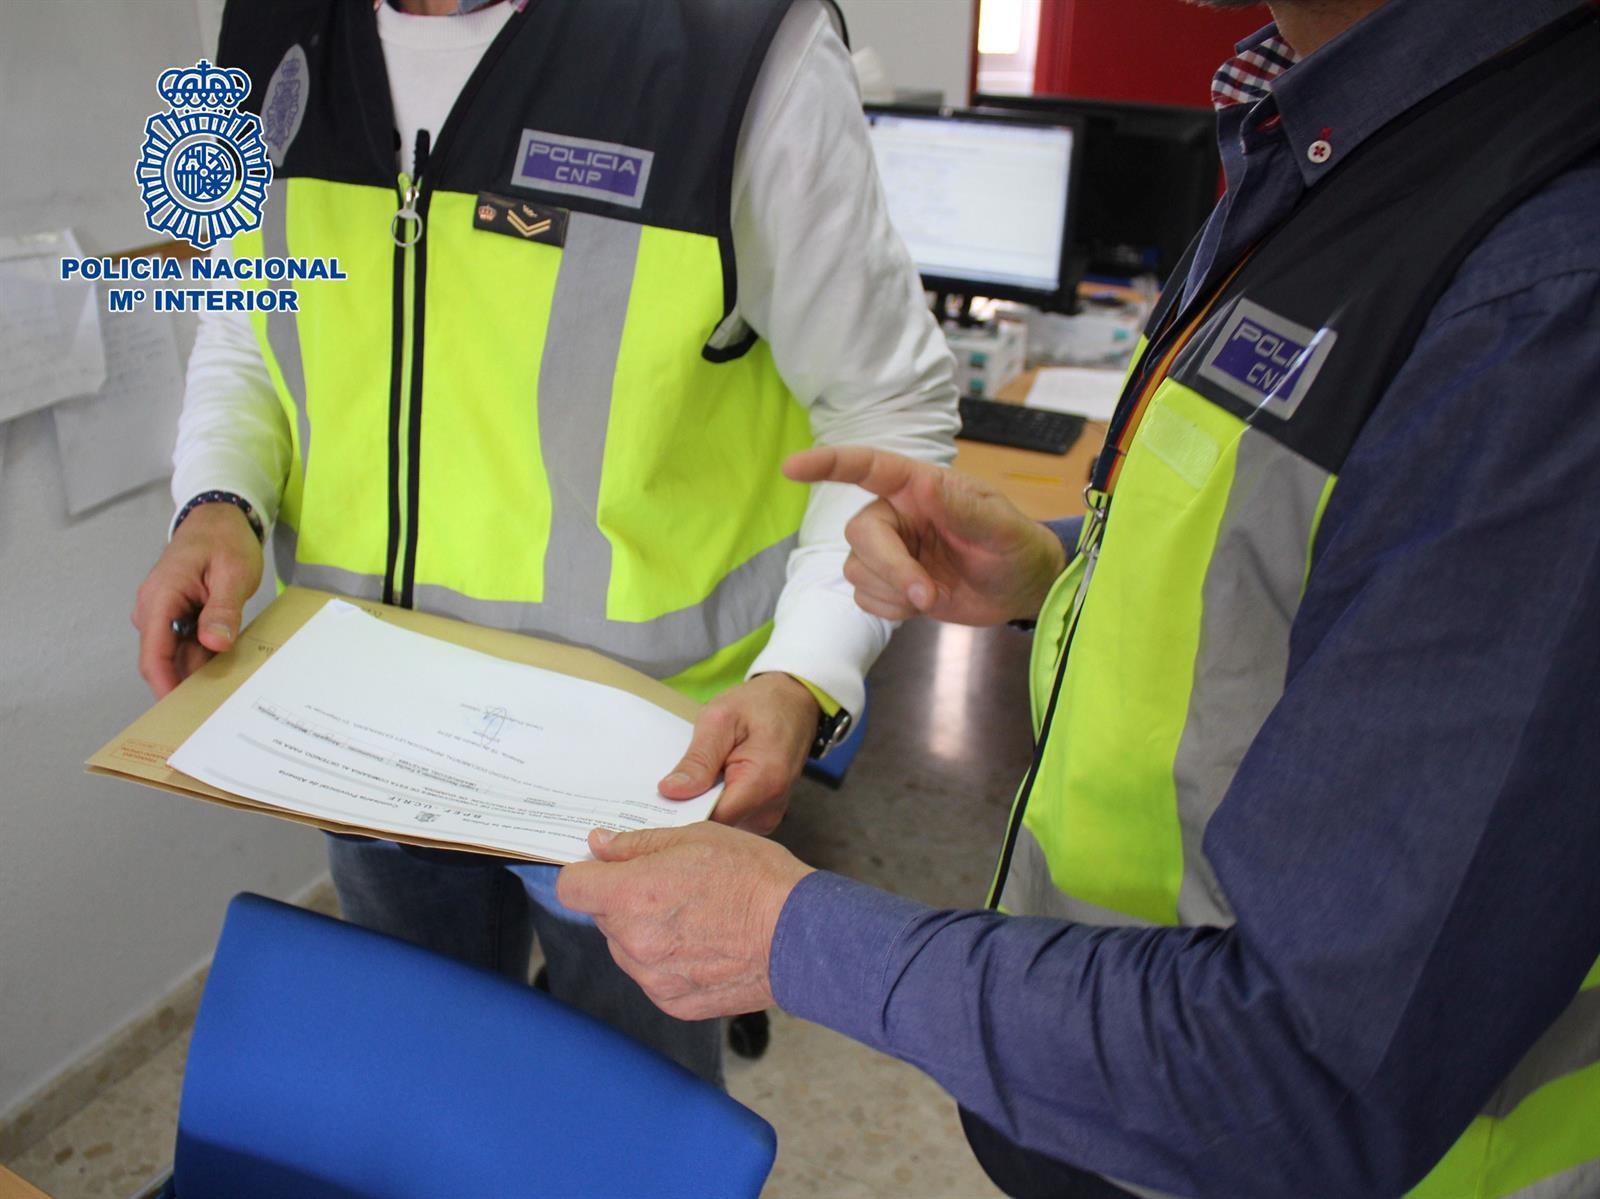 Detenido por realizar empadronamientos ilegales a extranjeros